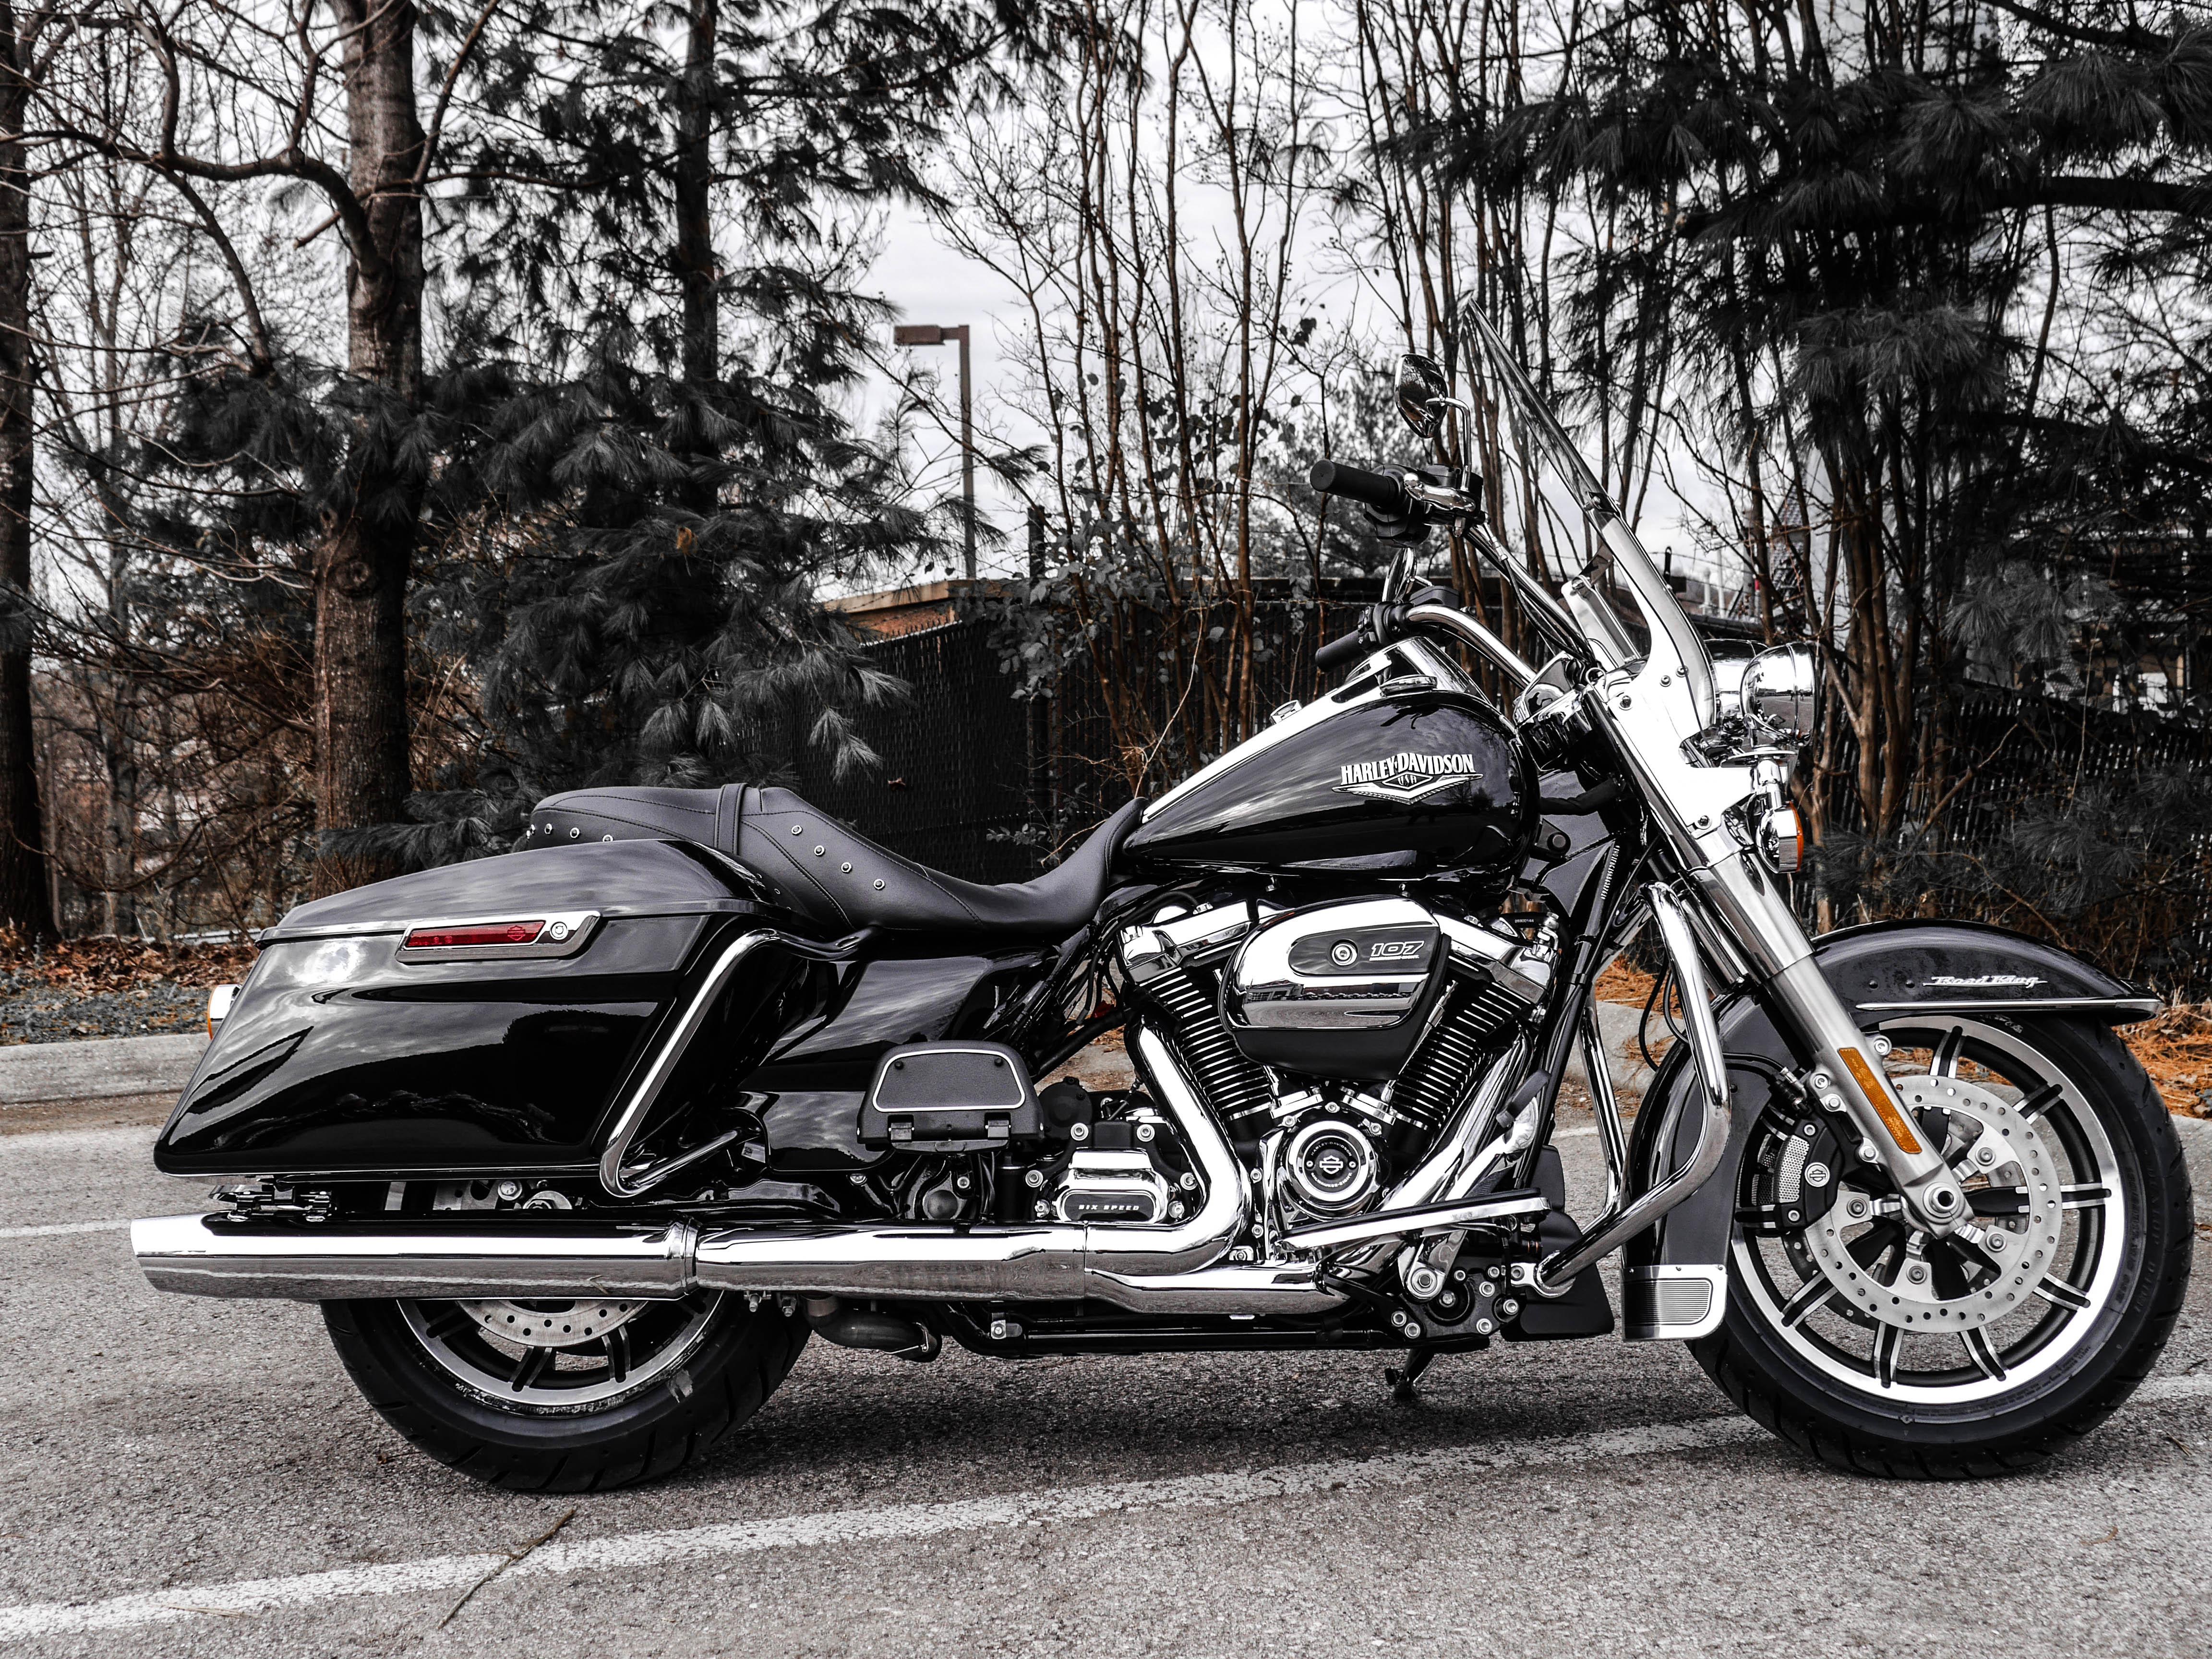 New 2019 Harley-Davidson Touring Road King